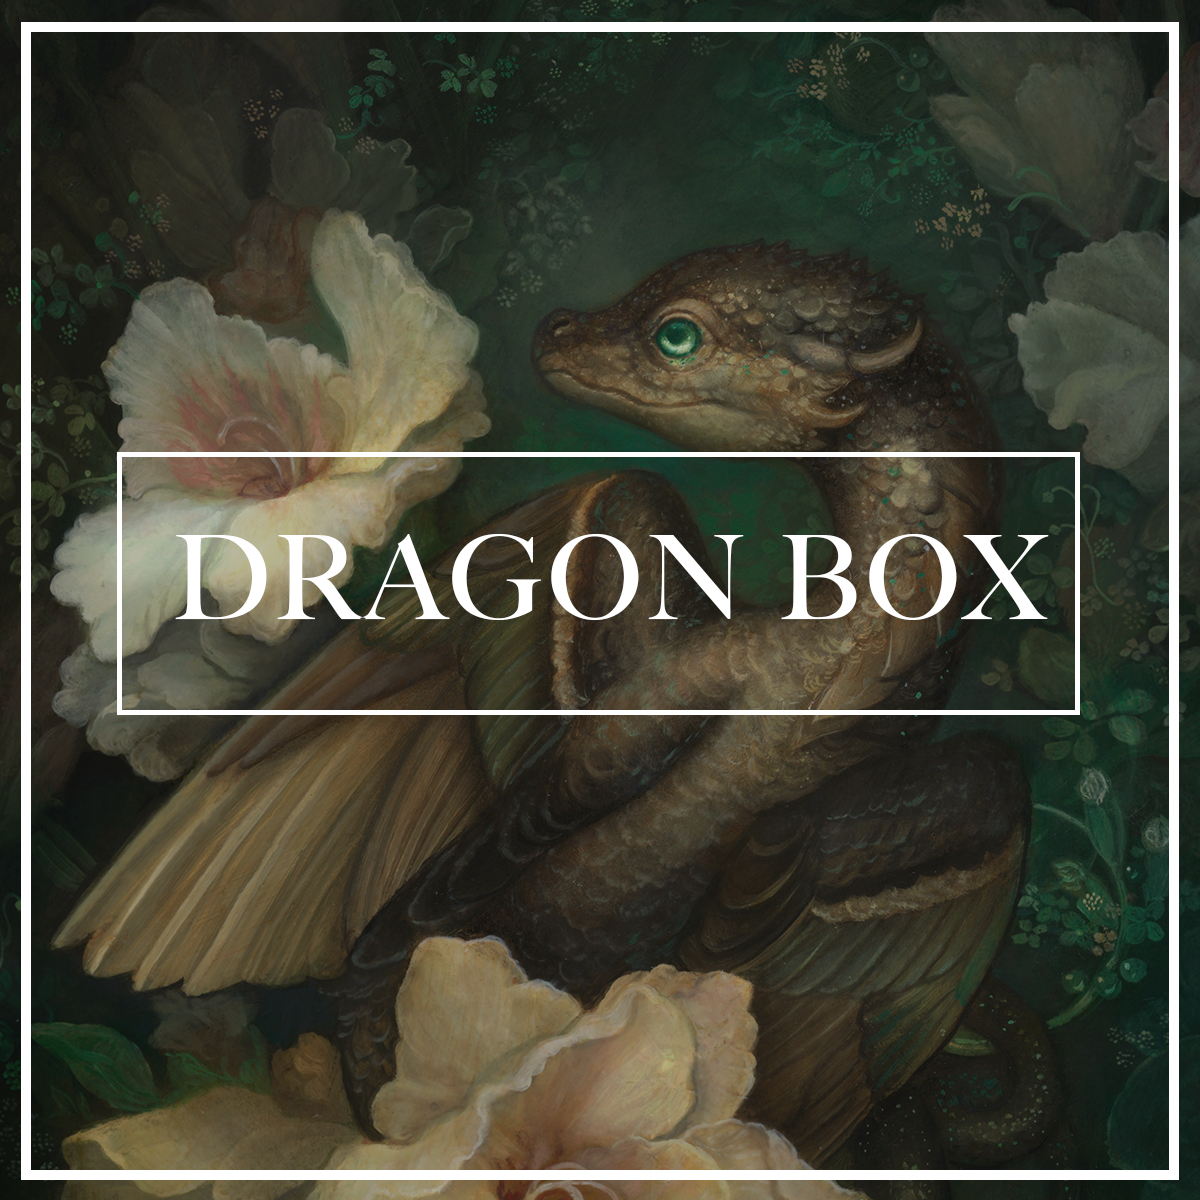 DragonBoxad2.jpg